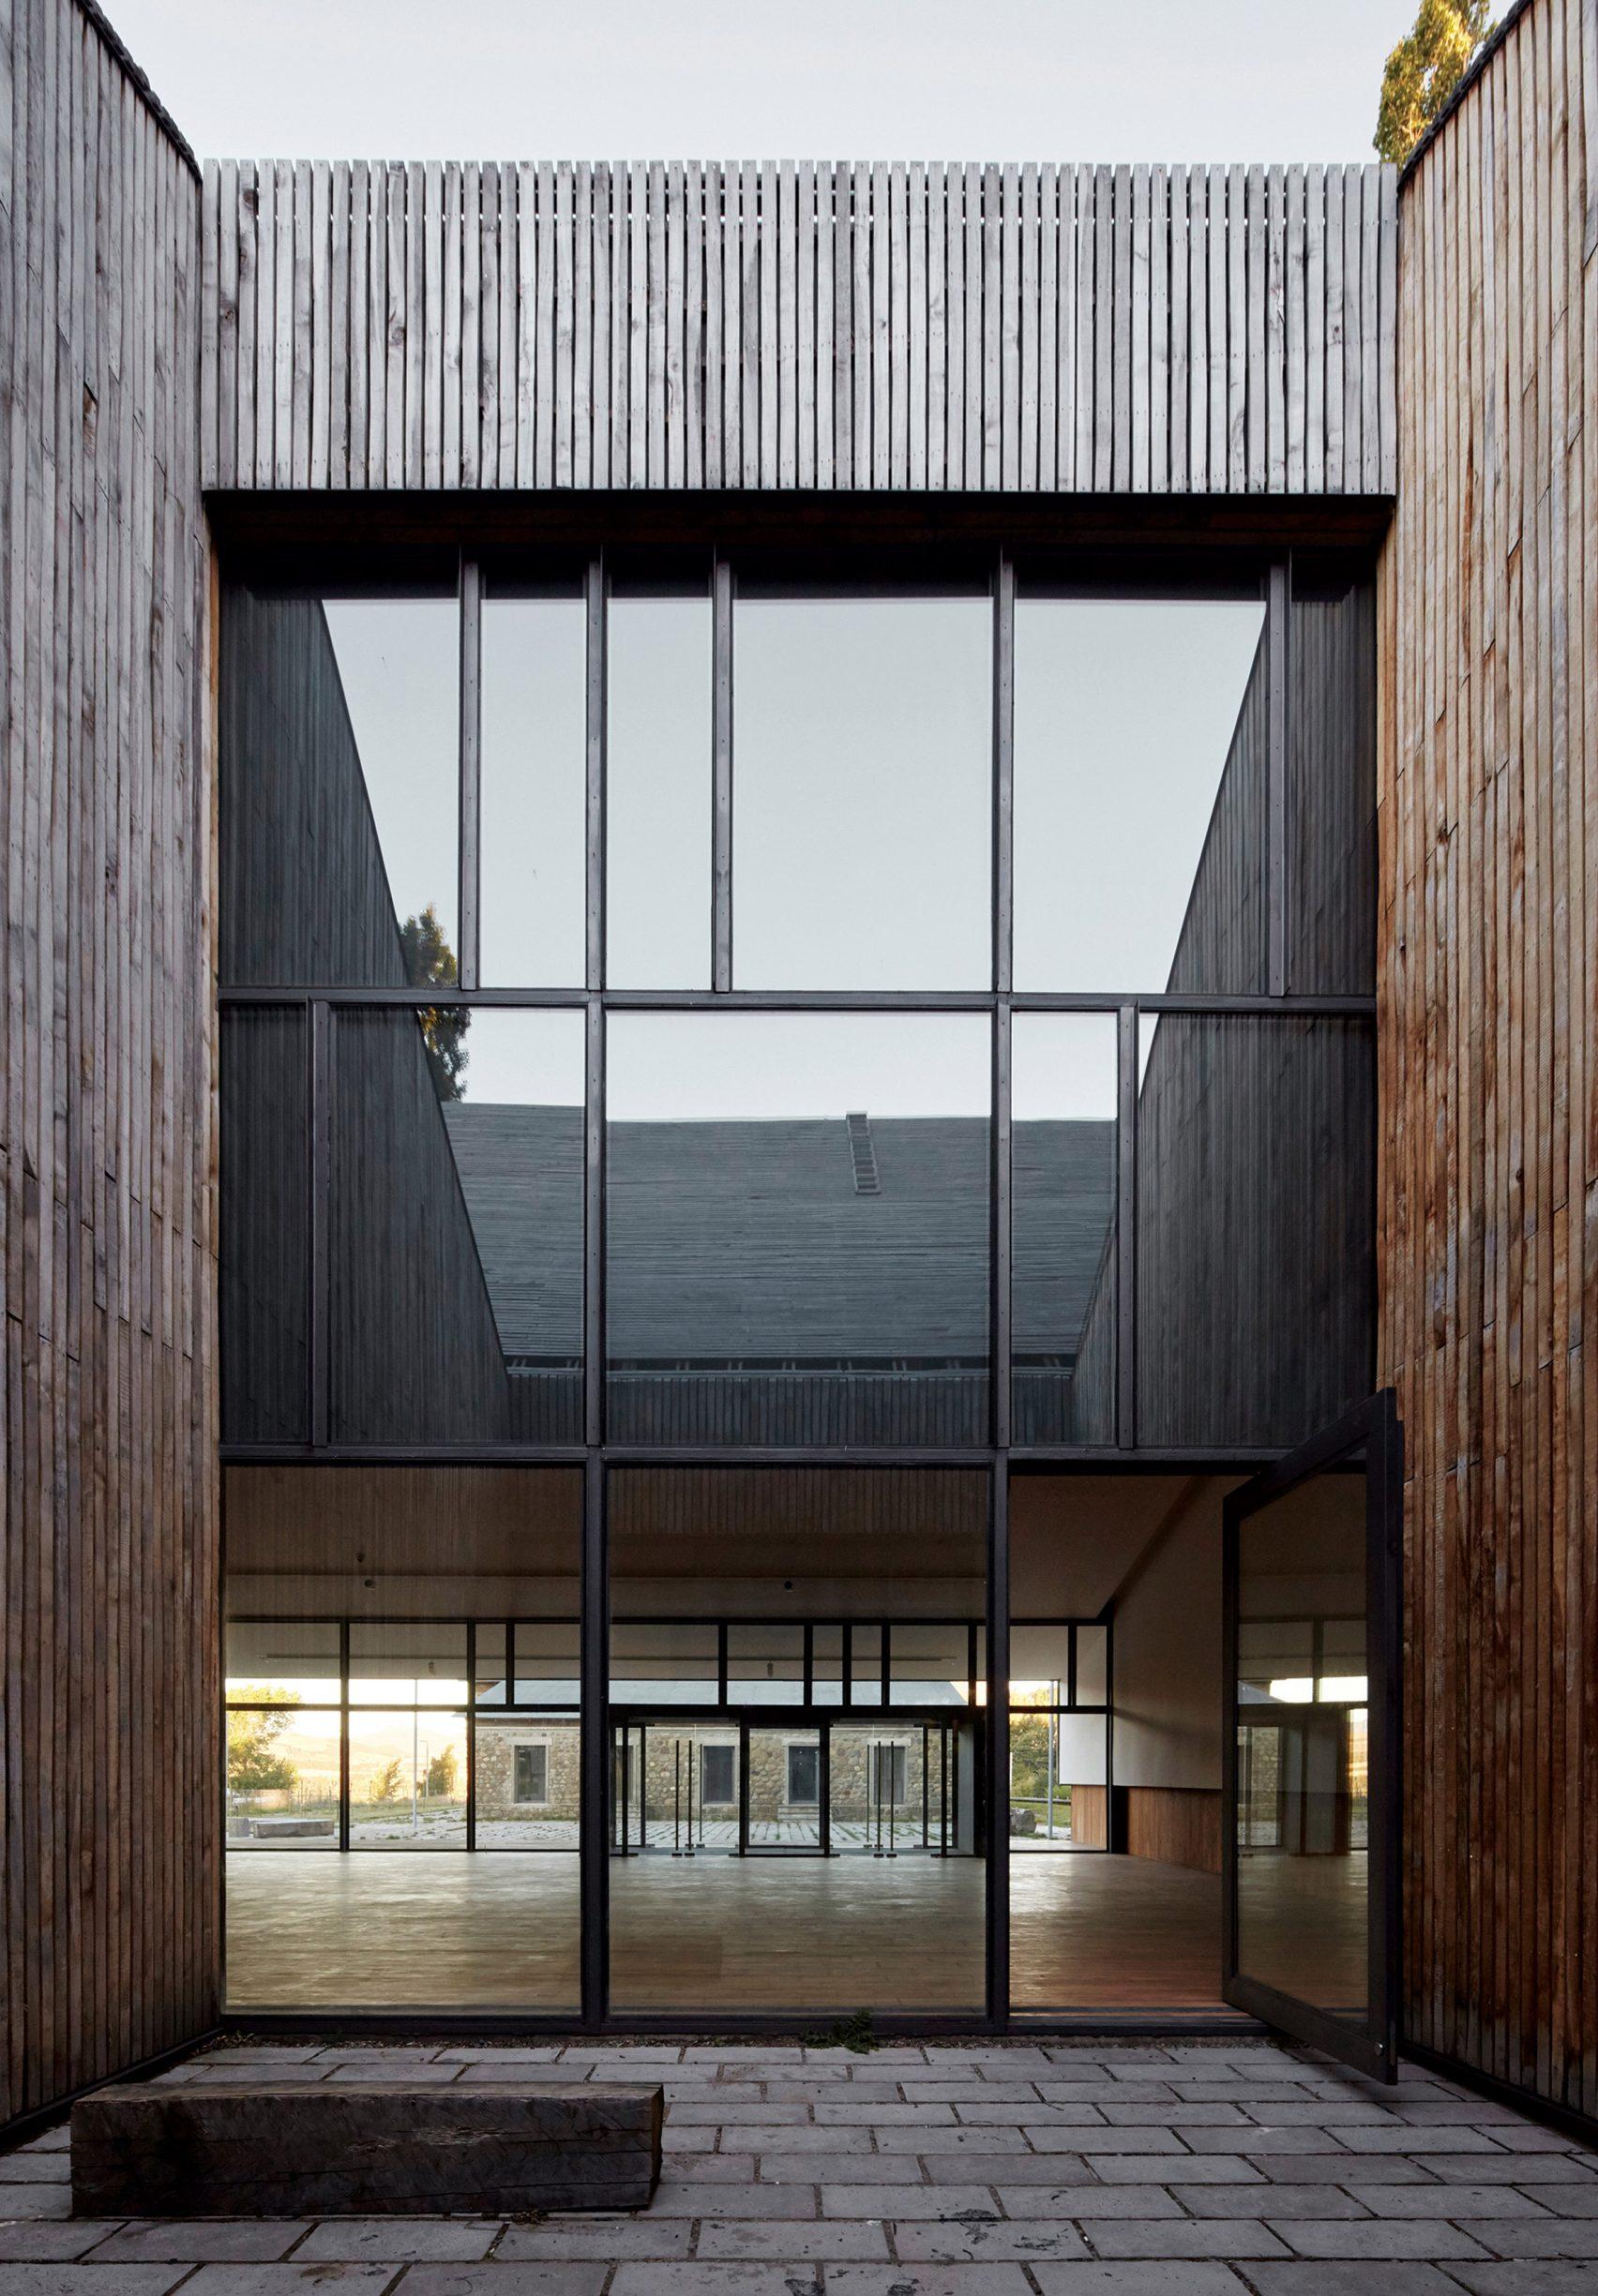 museo-regional-aysen-bbats-tirado-arquitectos-cristobal-palma-02